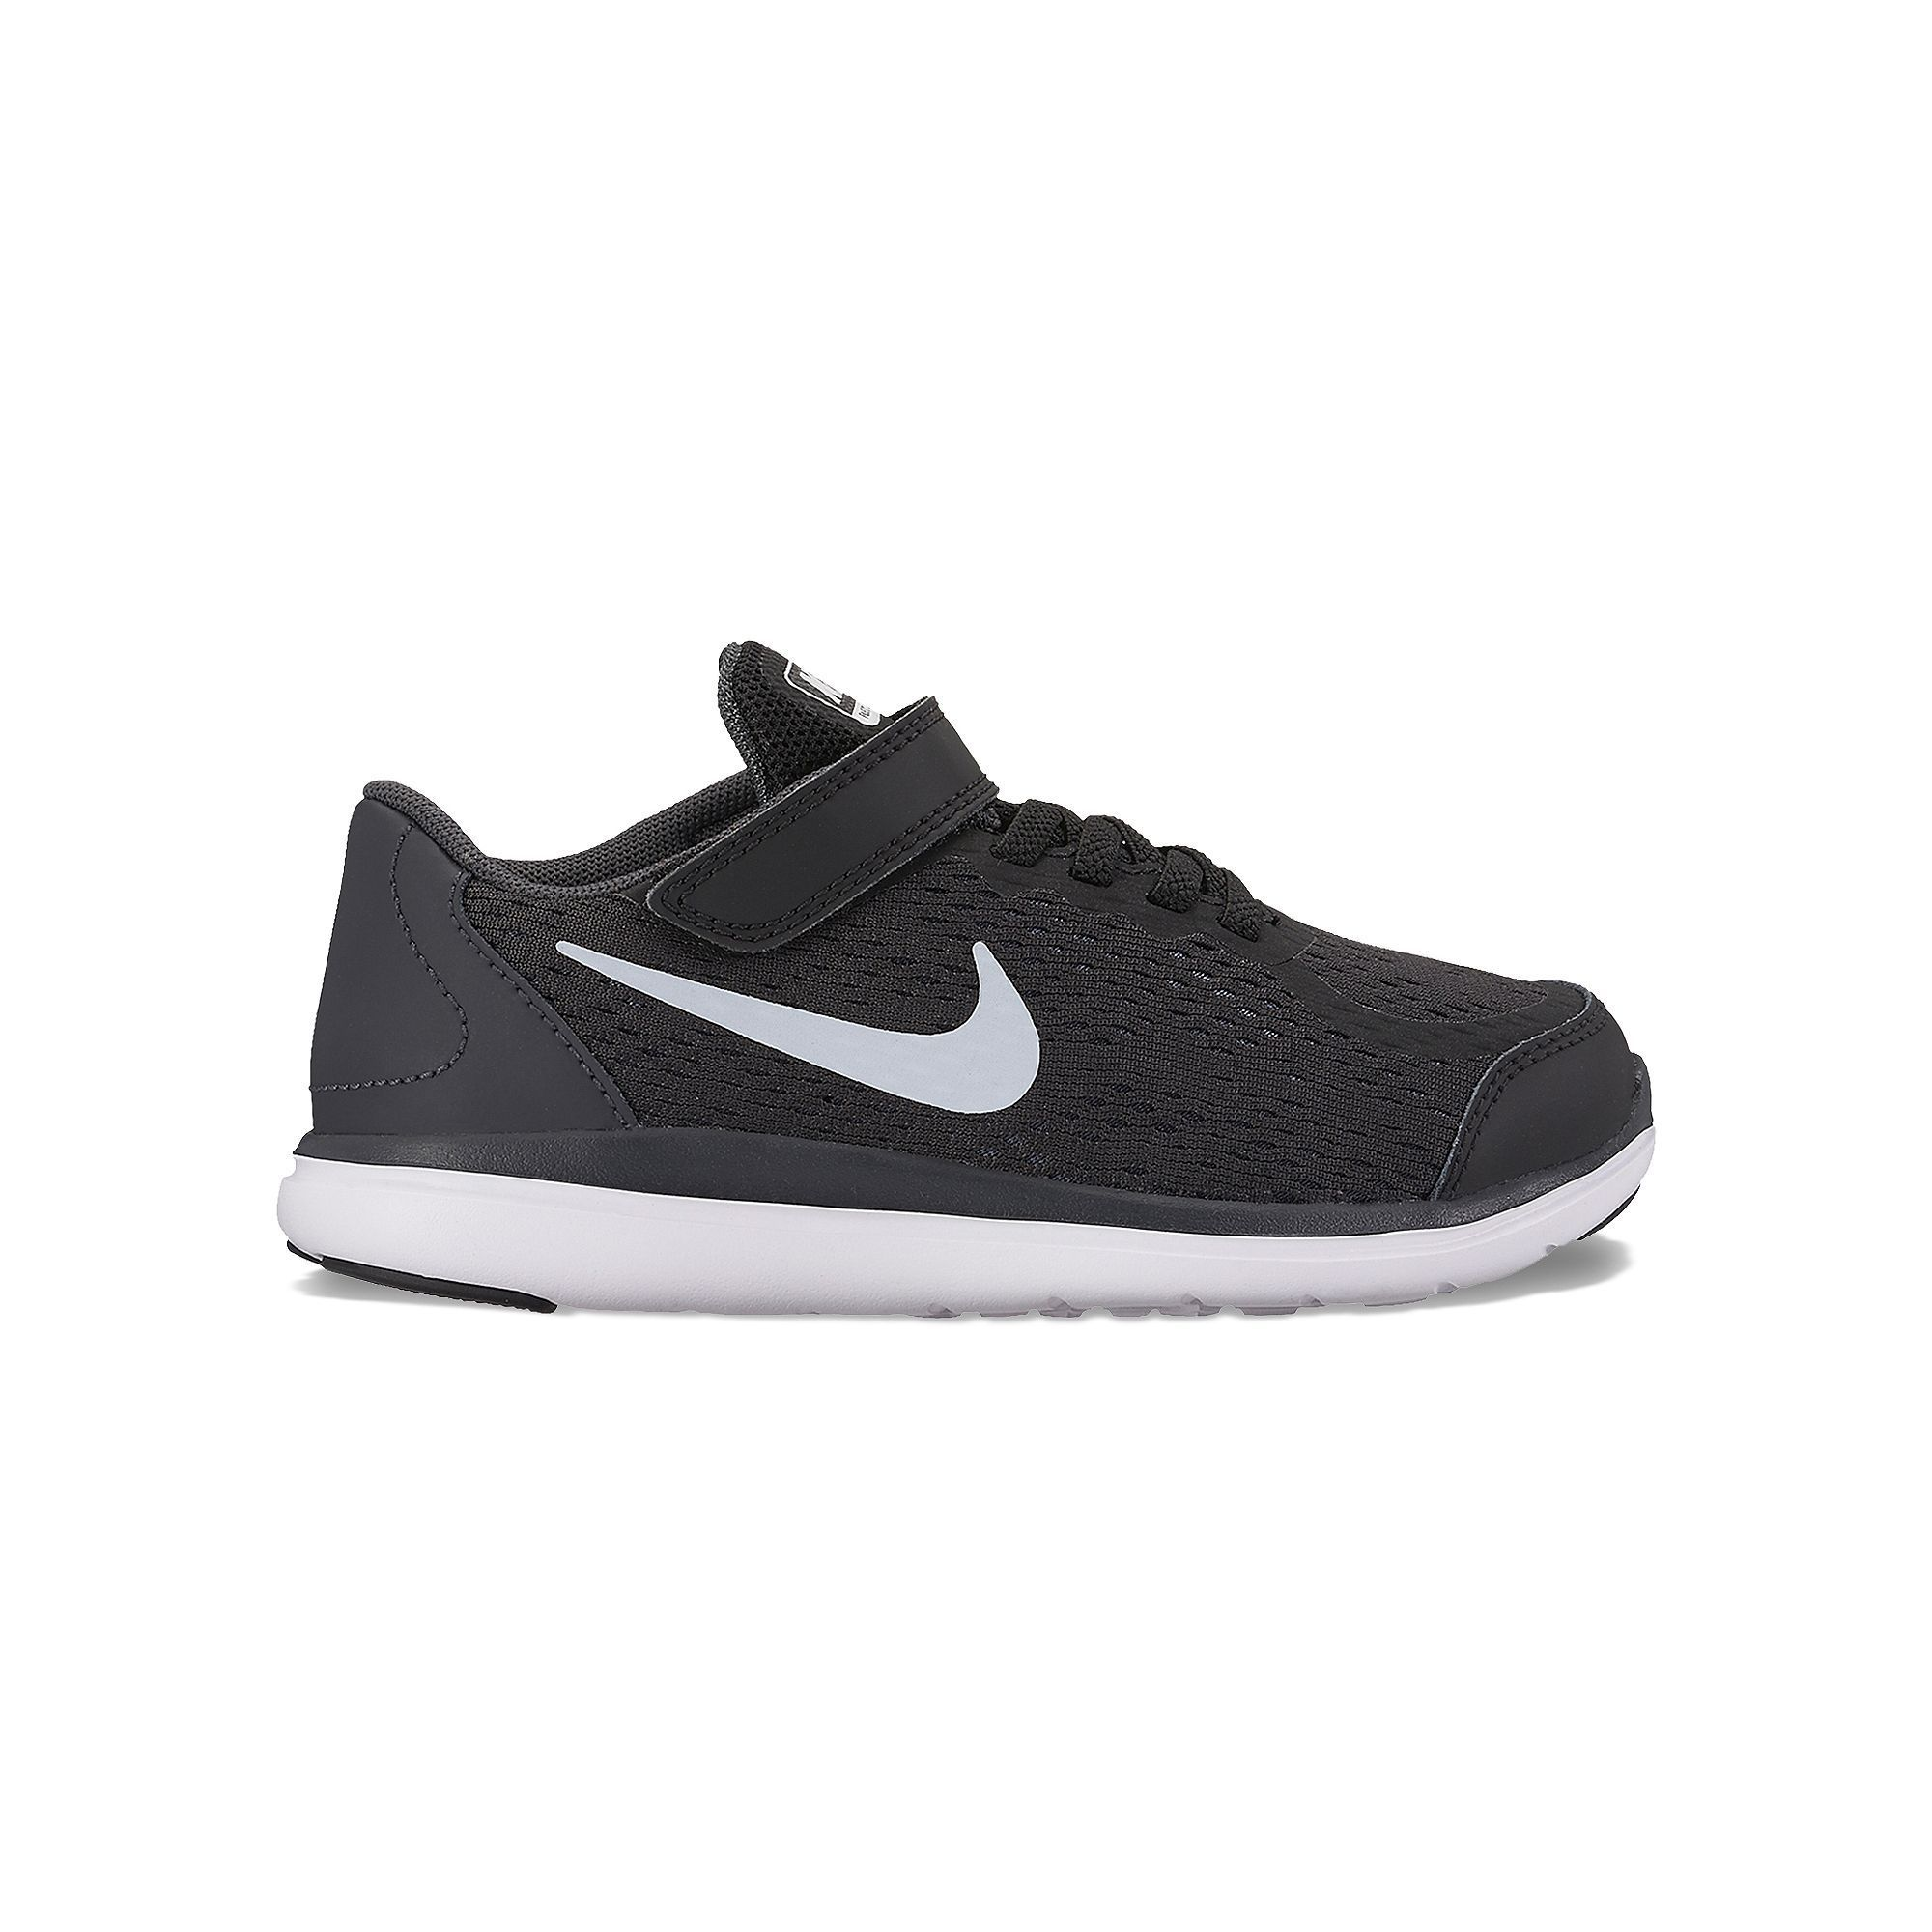 Nike Flex Run Mens Size 13 Running Athletic Shoes